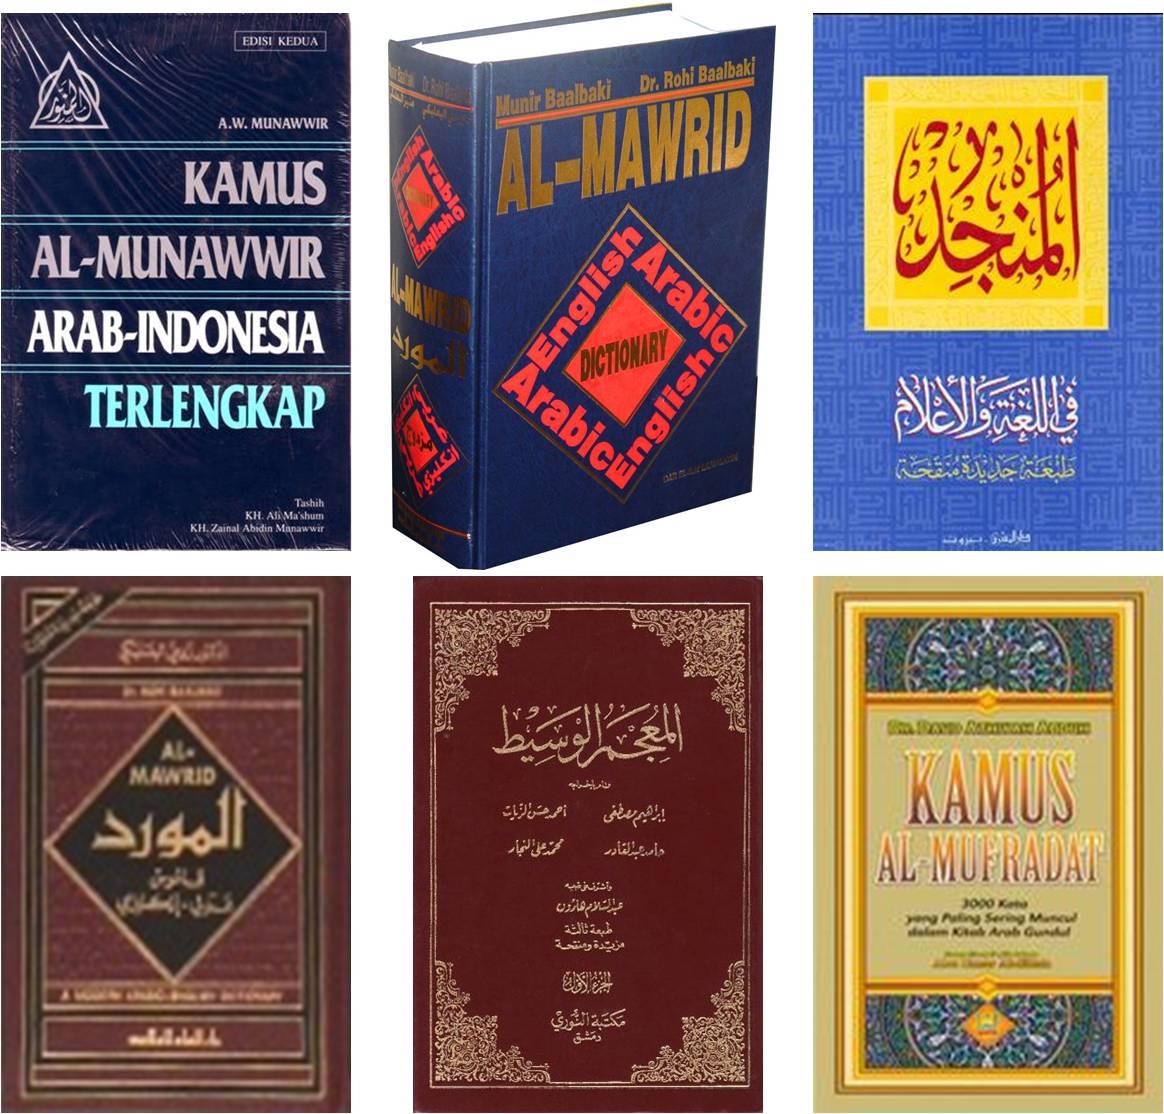 AL KALAAM INTERAKTIF   Segalanya Semudah ... ا ب ت Tips Kedua Memiliki Kamus Arab dan Tahu ...